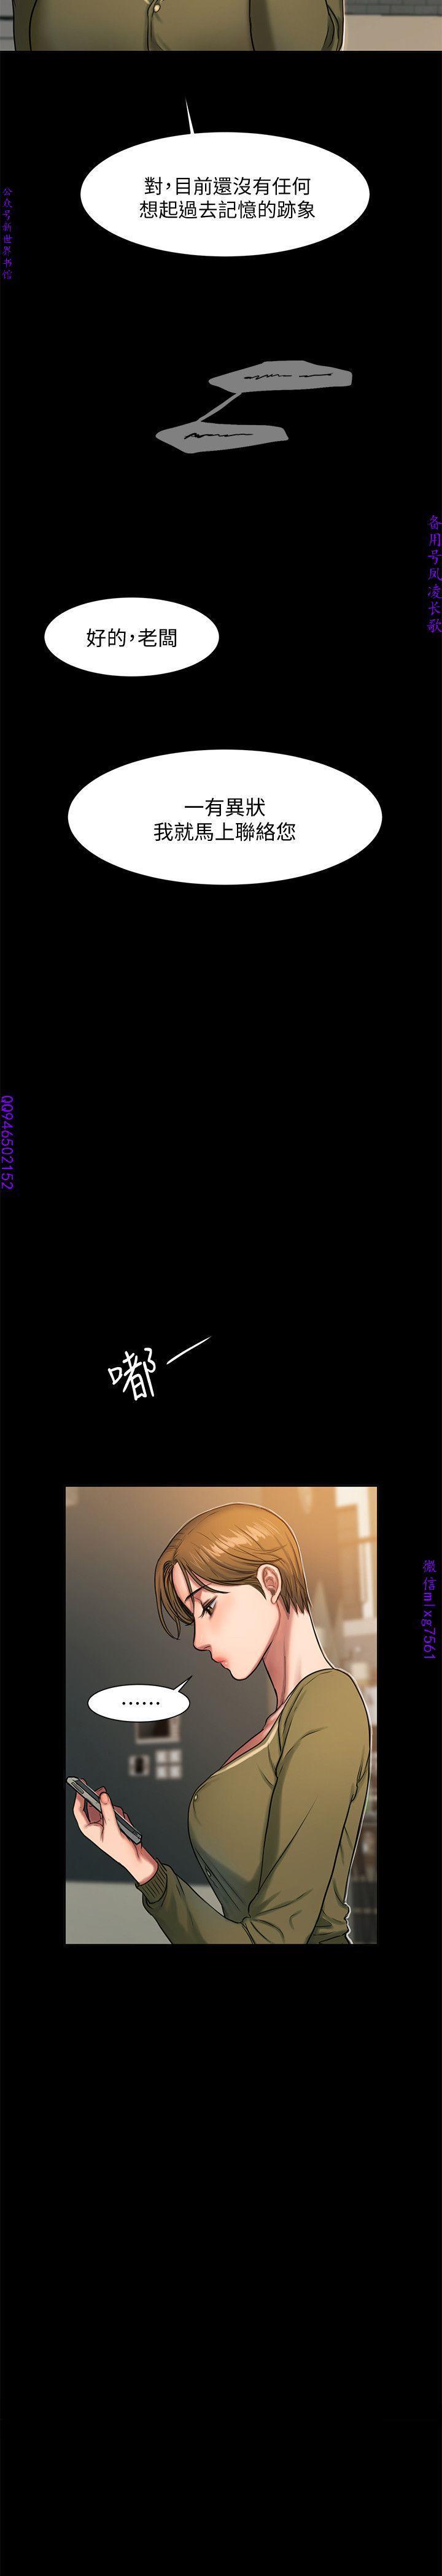 Run away 1-10【中文】 200